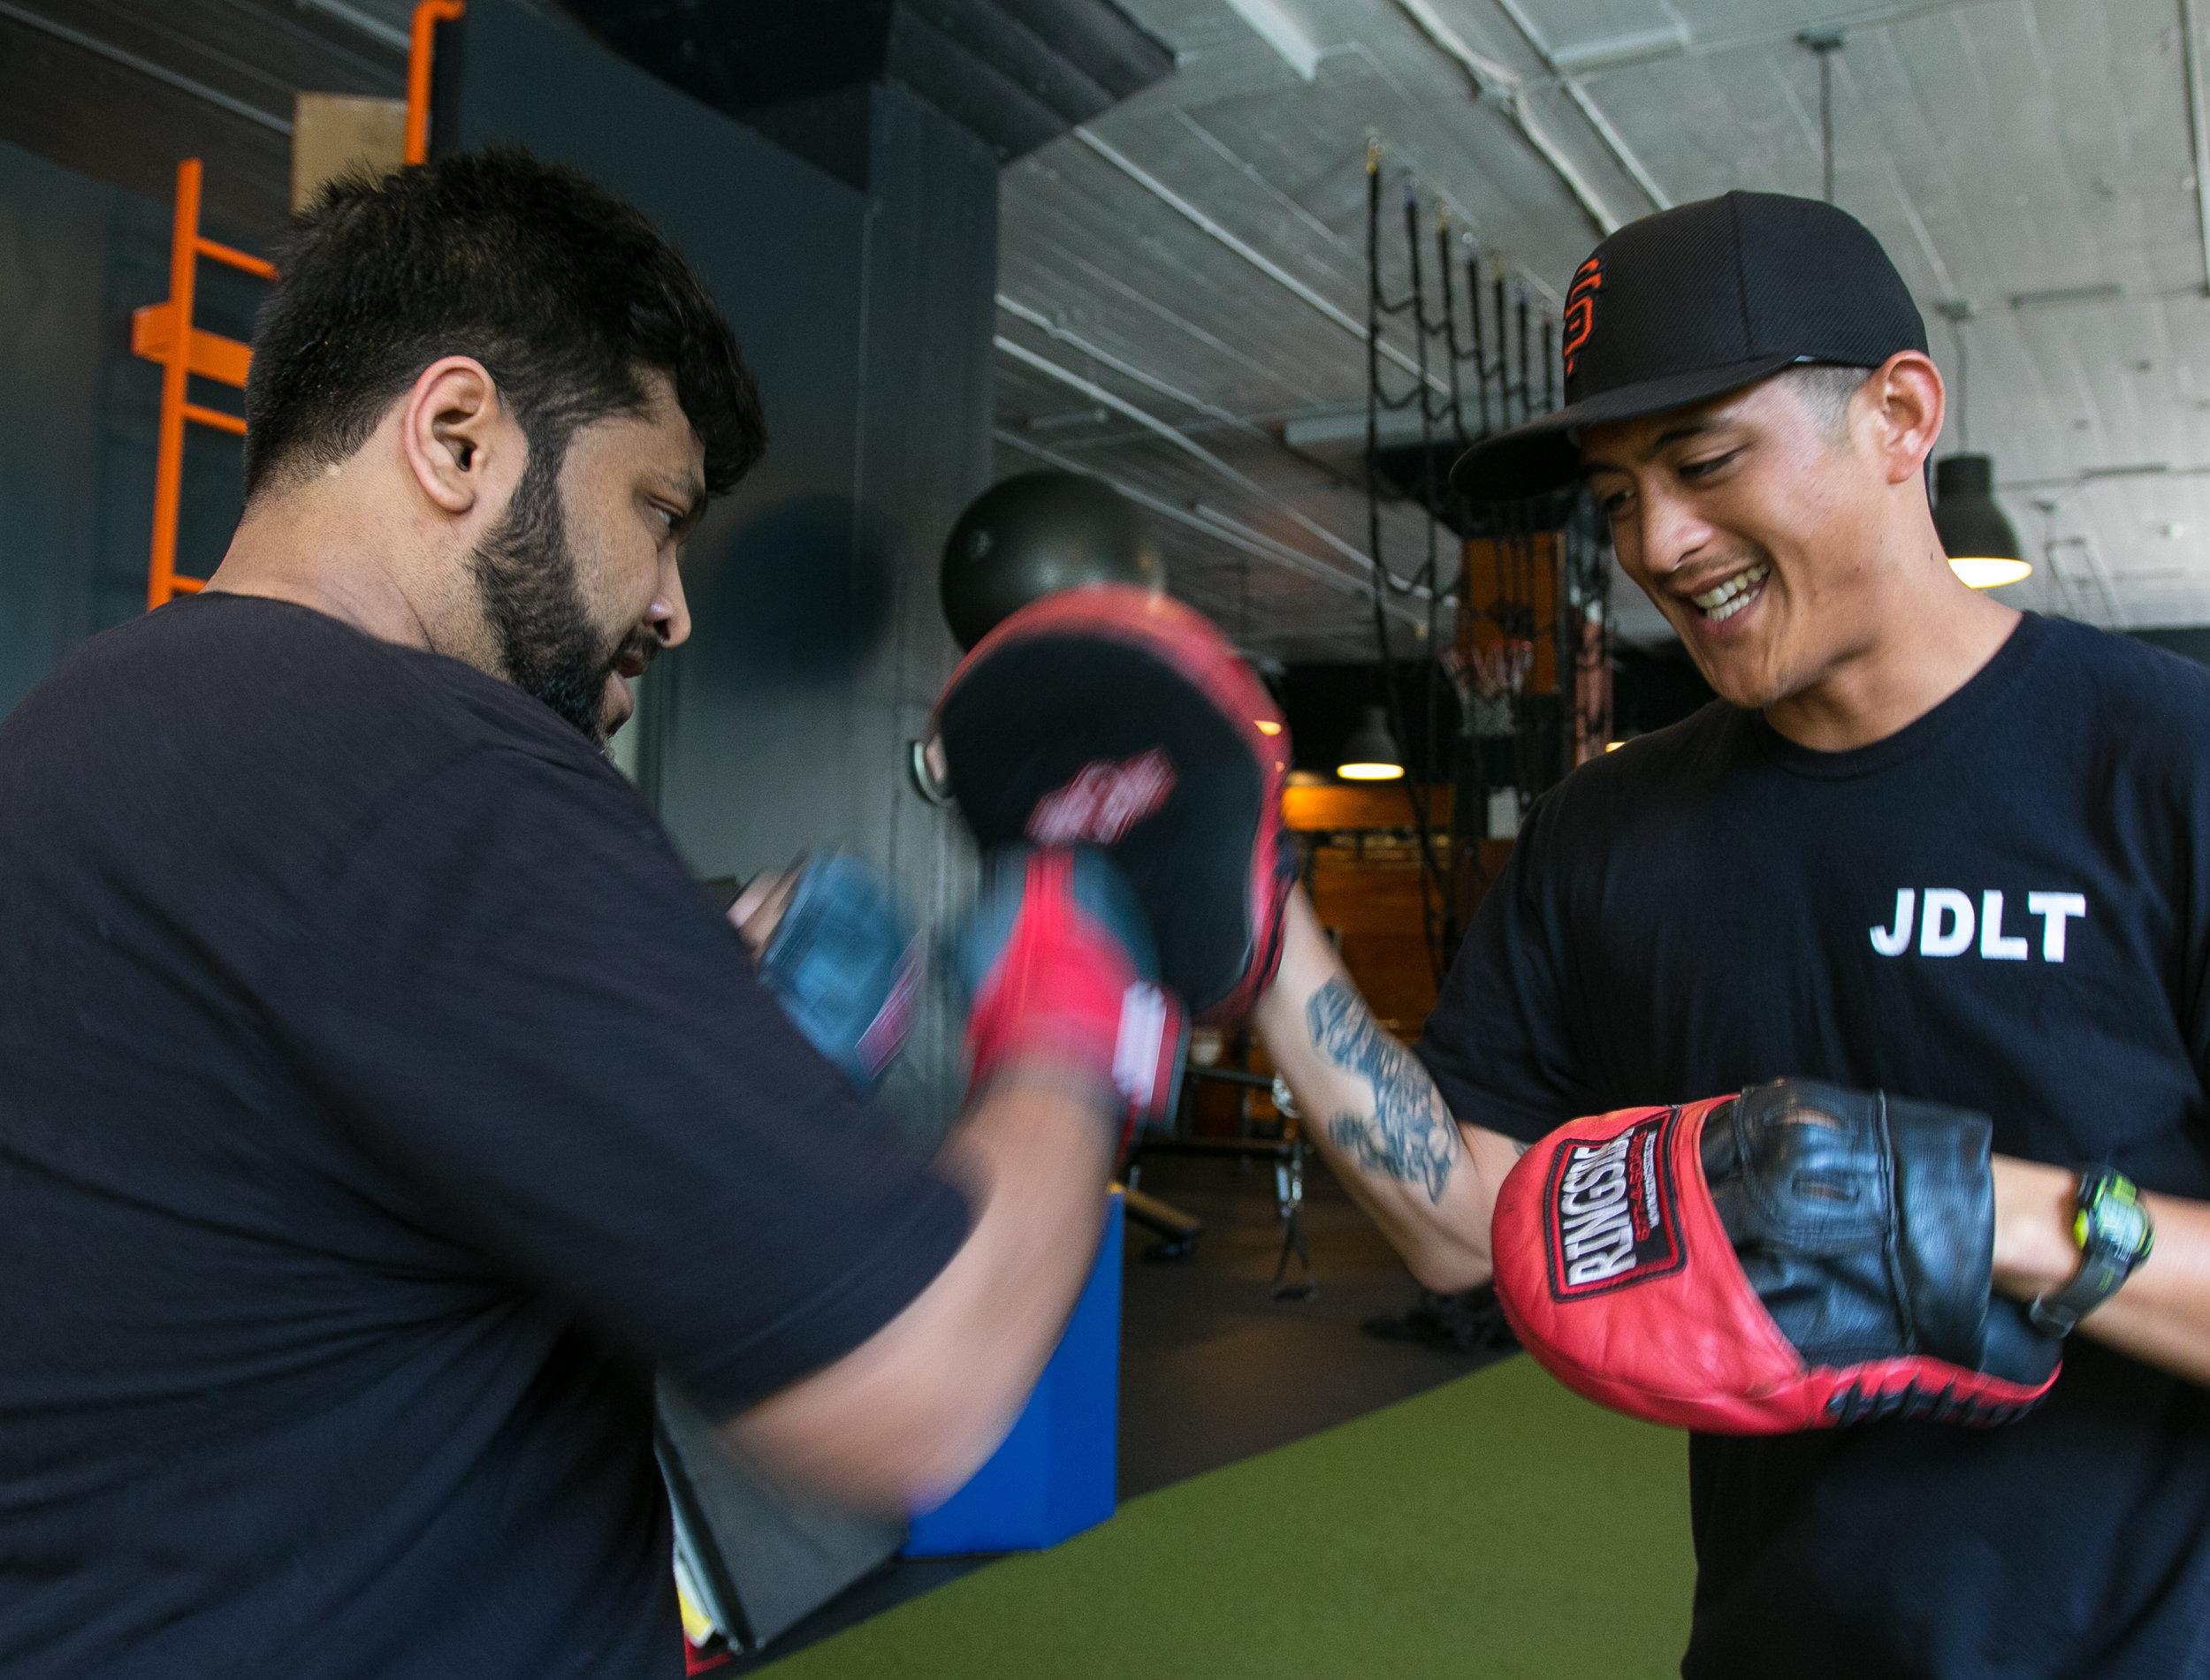 JDLT trainer client boxing